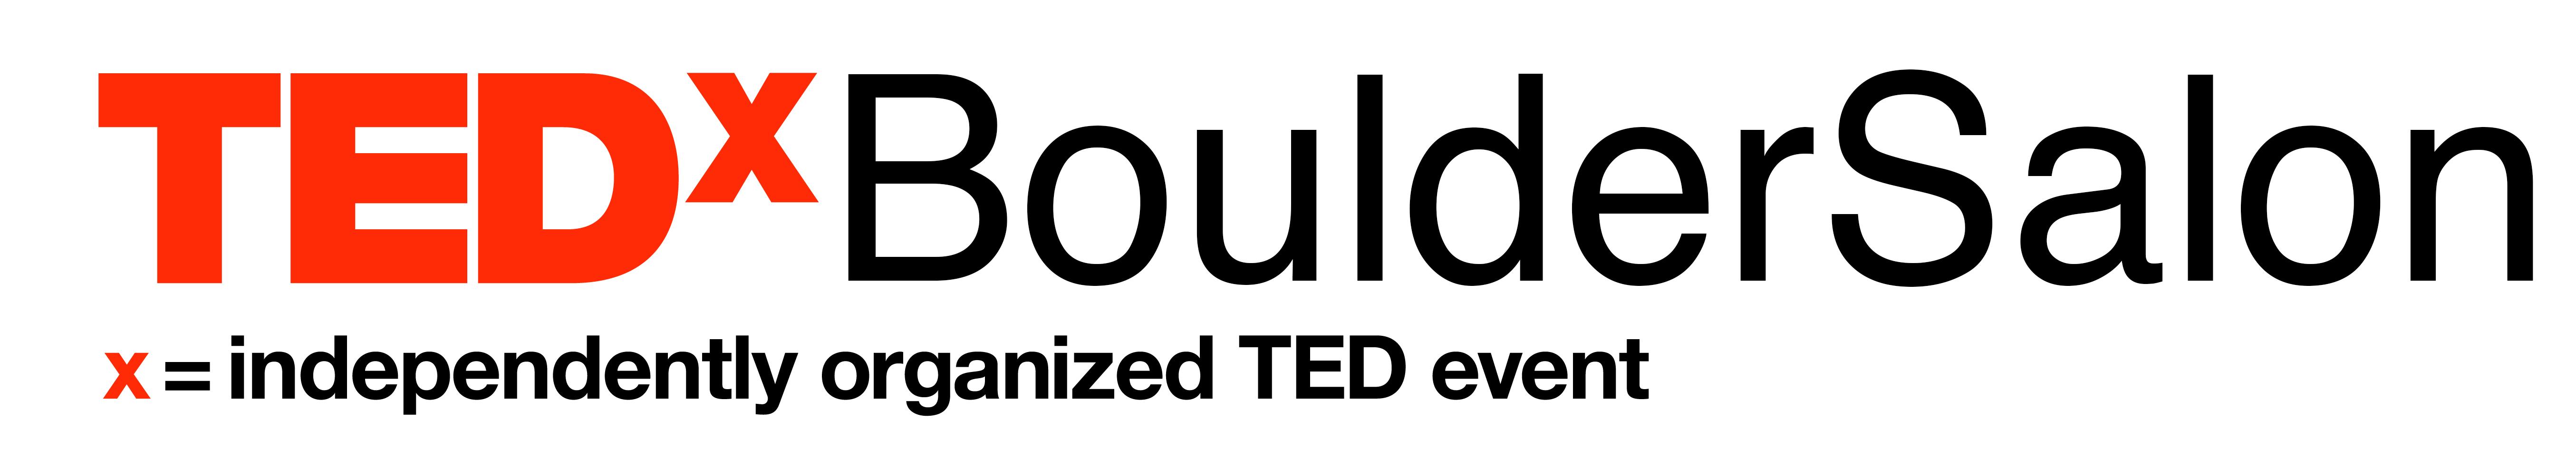 TEDxBoulderSalon-Logo.png#asset:877